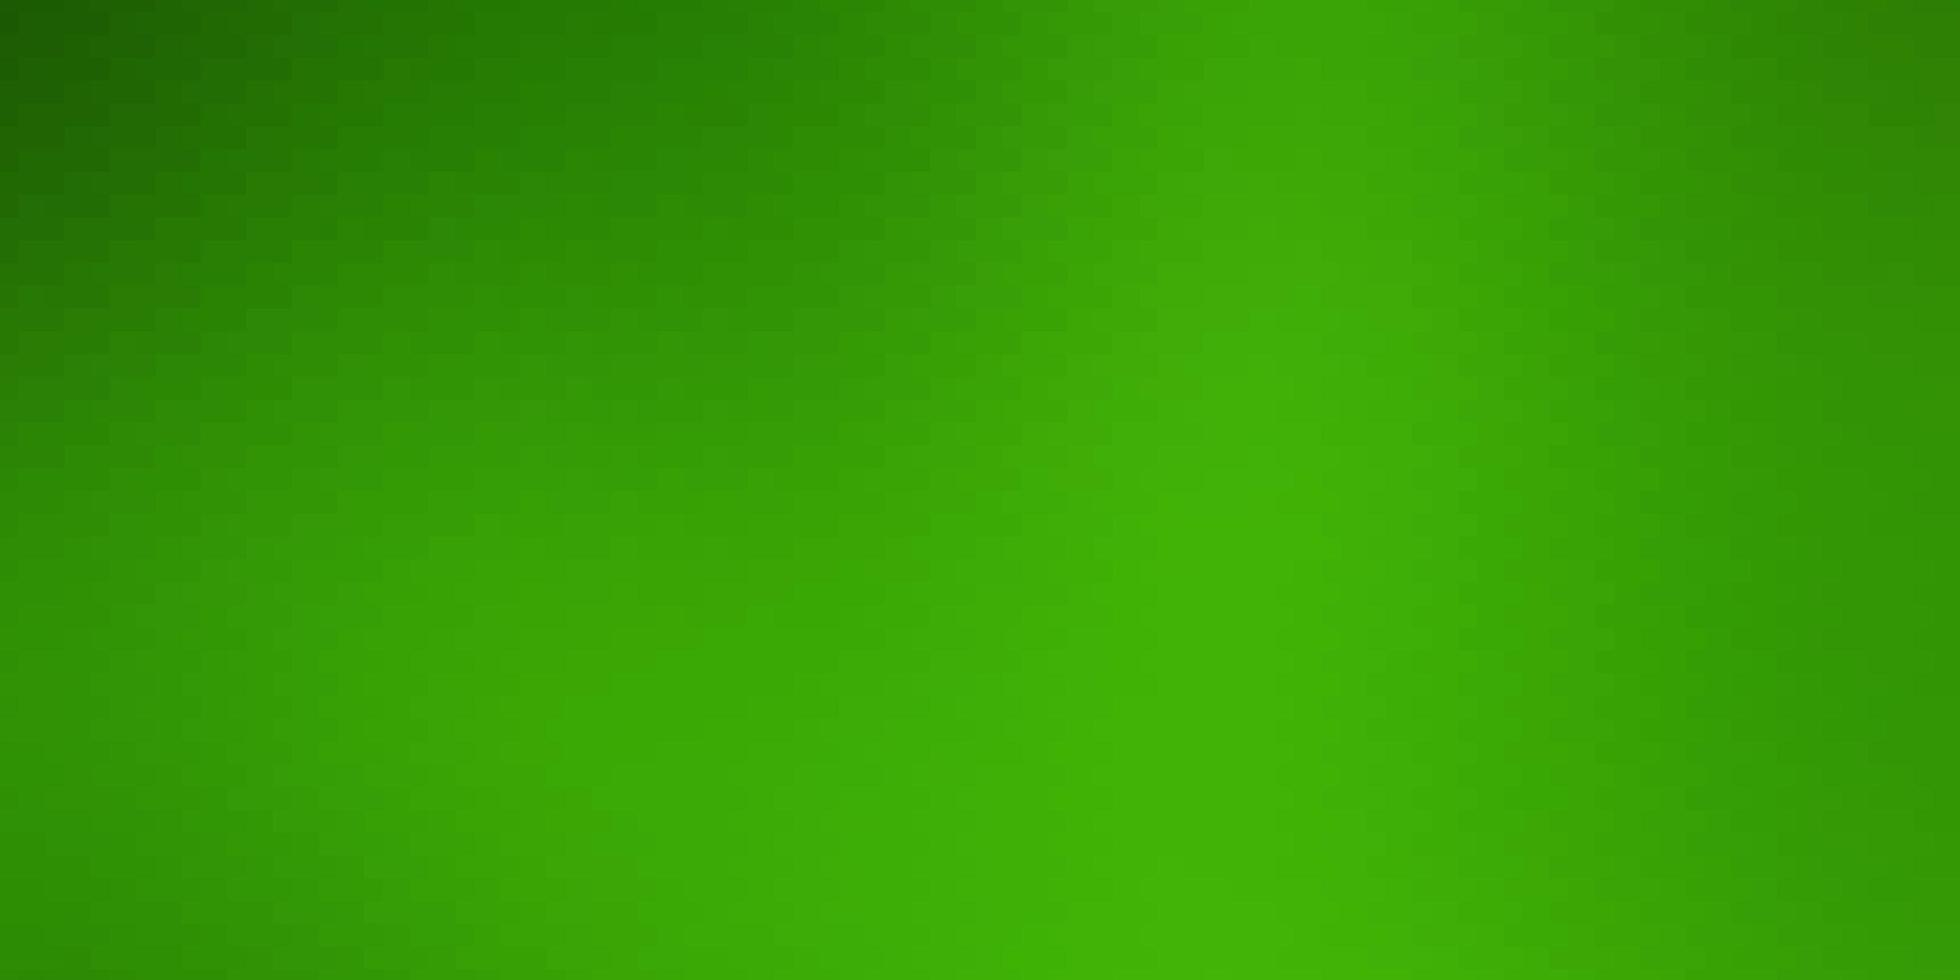 fundo verde claro em estilo poligonal. vetor